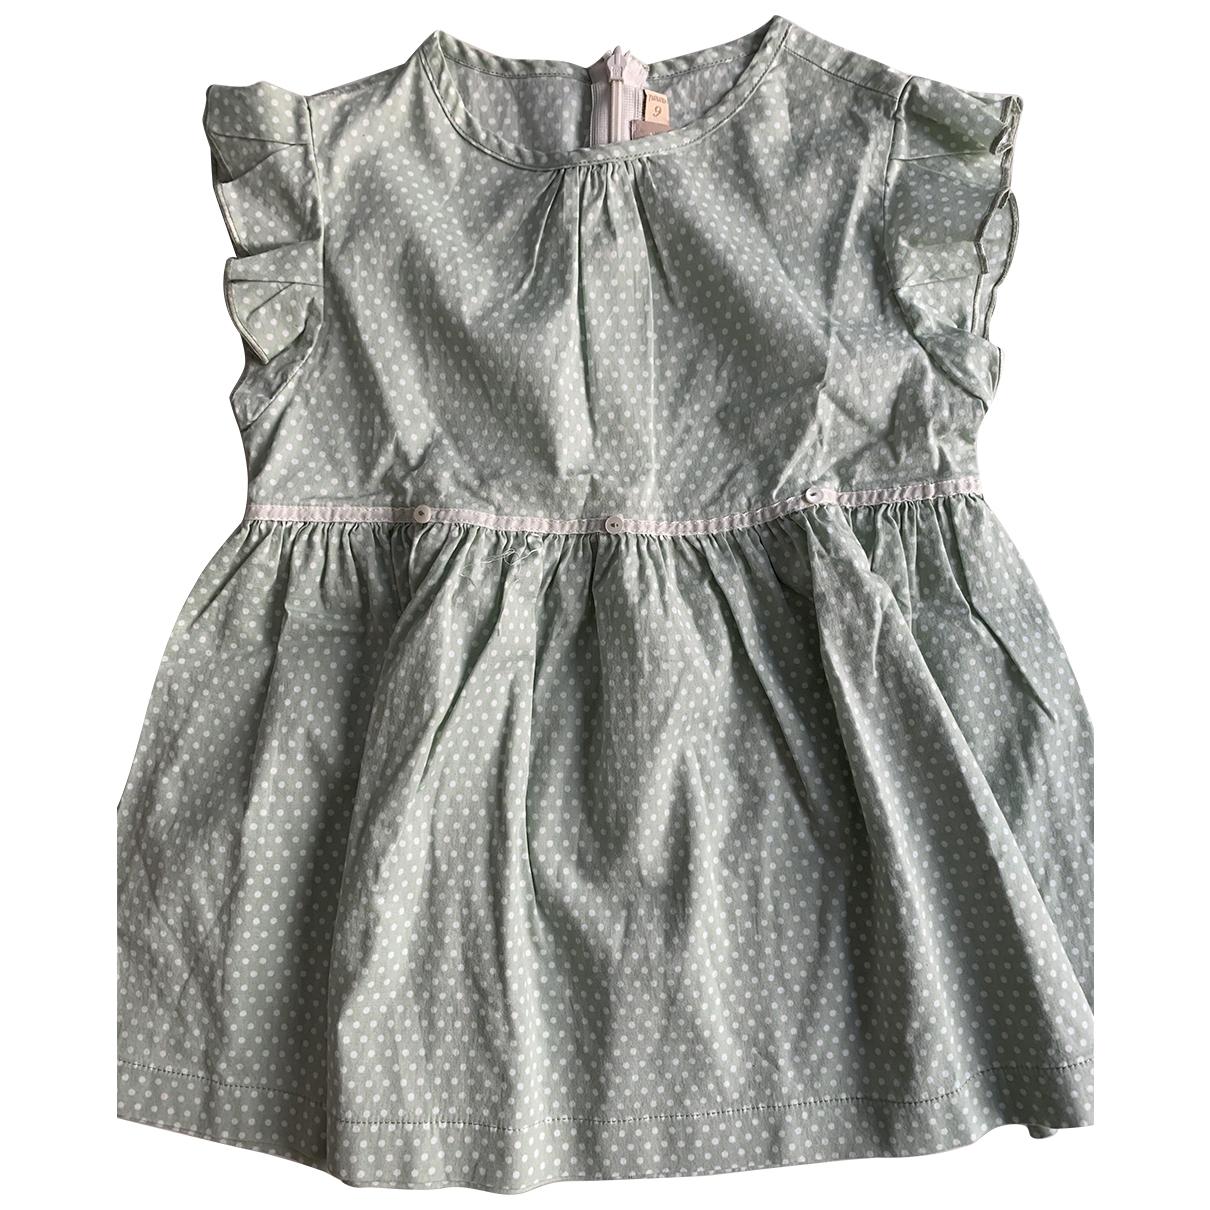 La Stupenderia \N Kleid in  Gruen Baumwolle